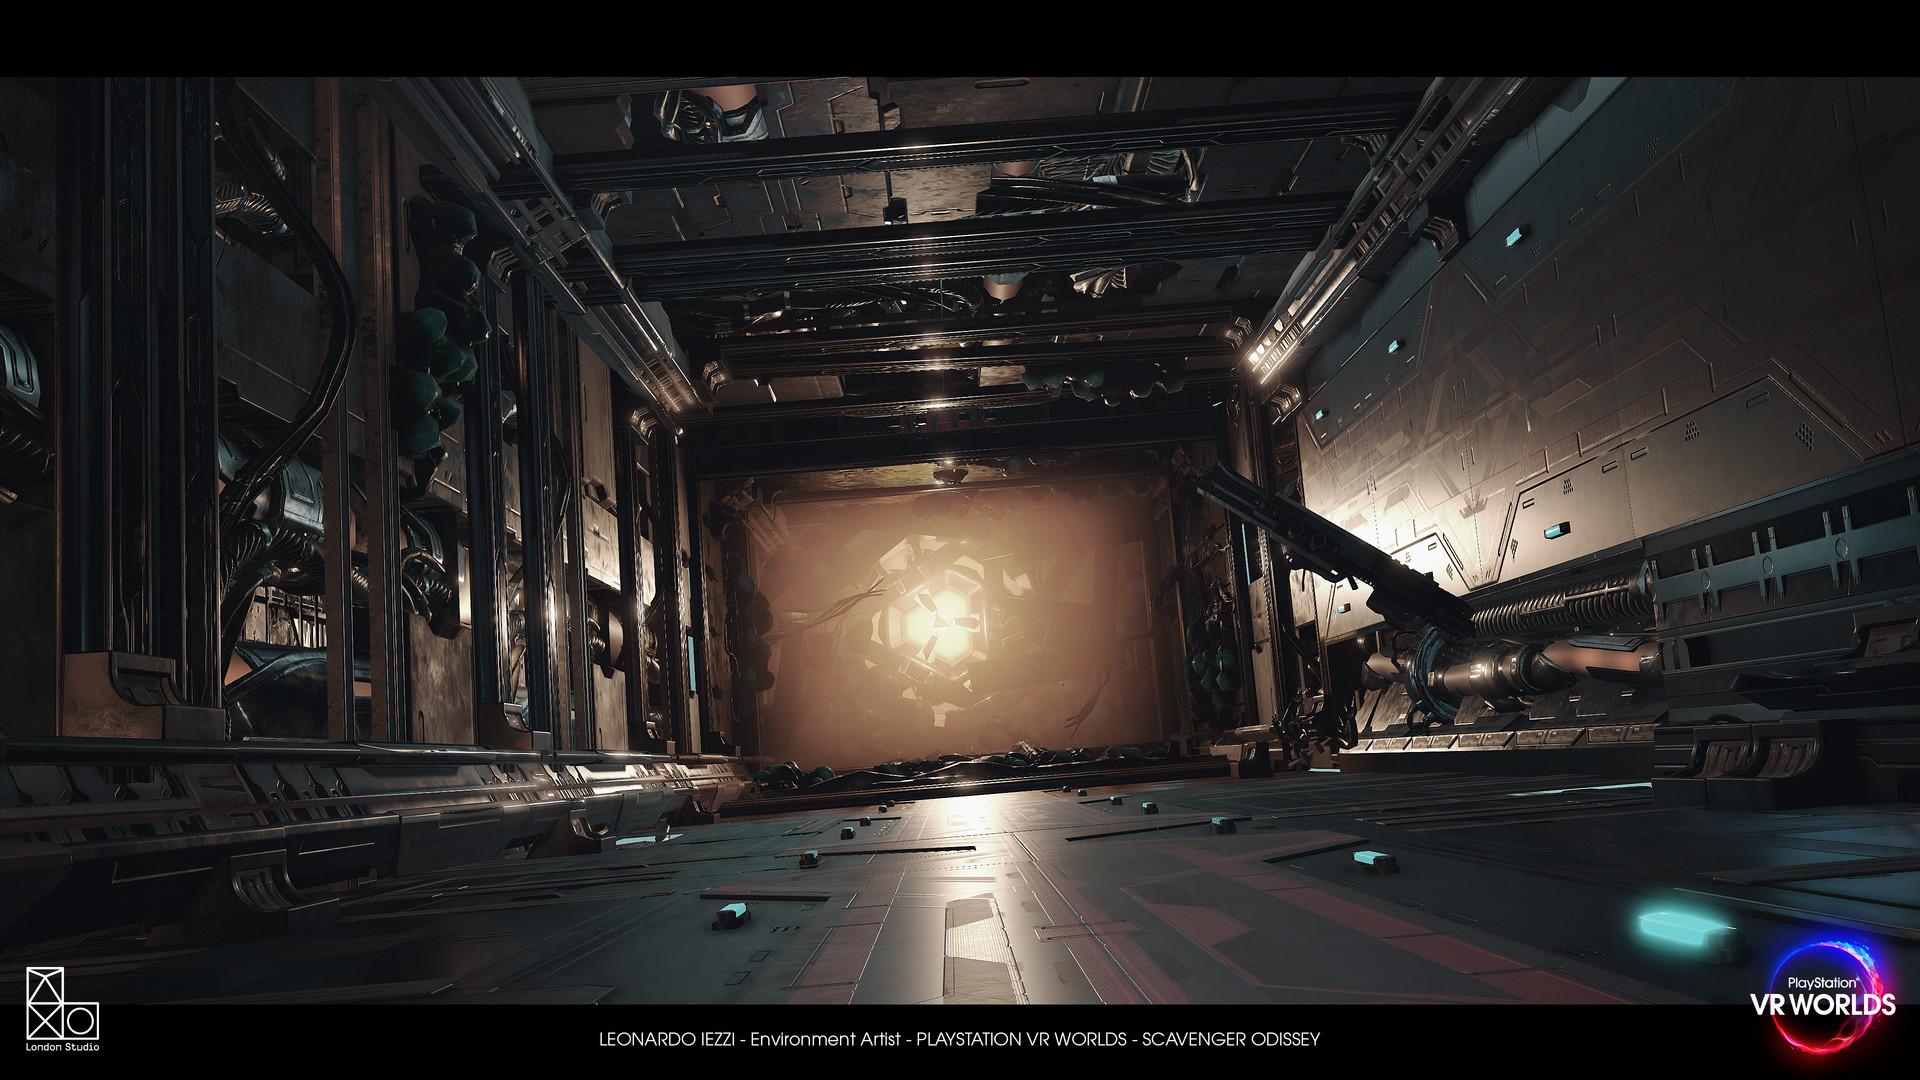 Leonardo iezzi leonardo iezzi environment artist vr worlds scavenger odissey 01